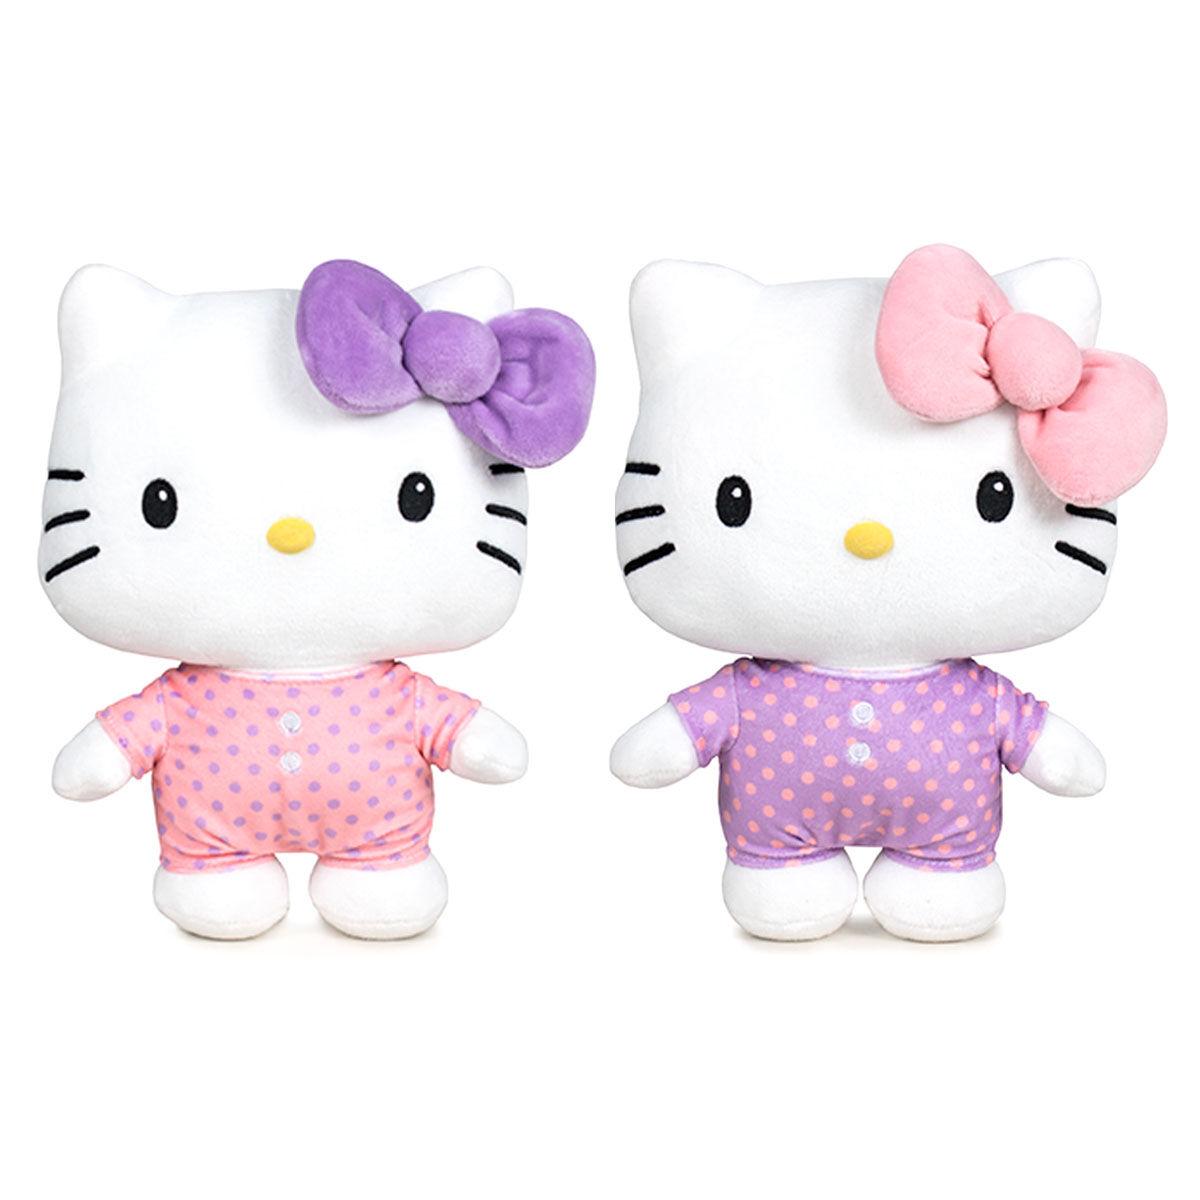 Peluche Hello Kitty Pijama Party 34cm surtido 8425611387265